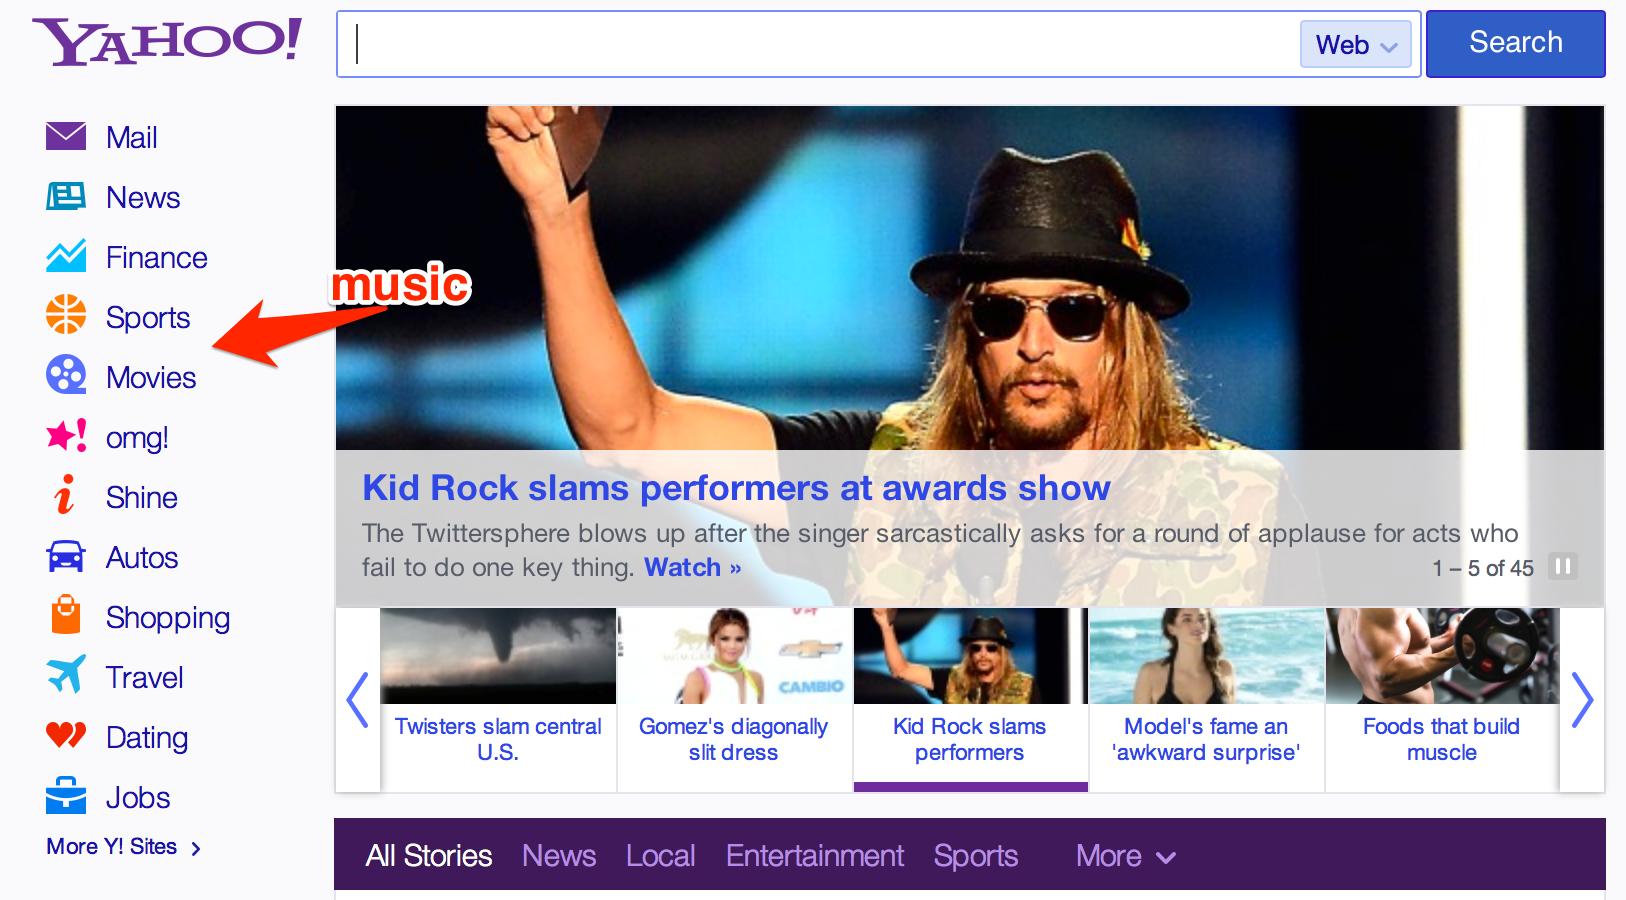 Yahoo Shine dating